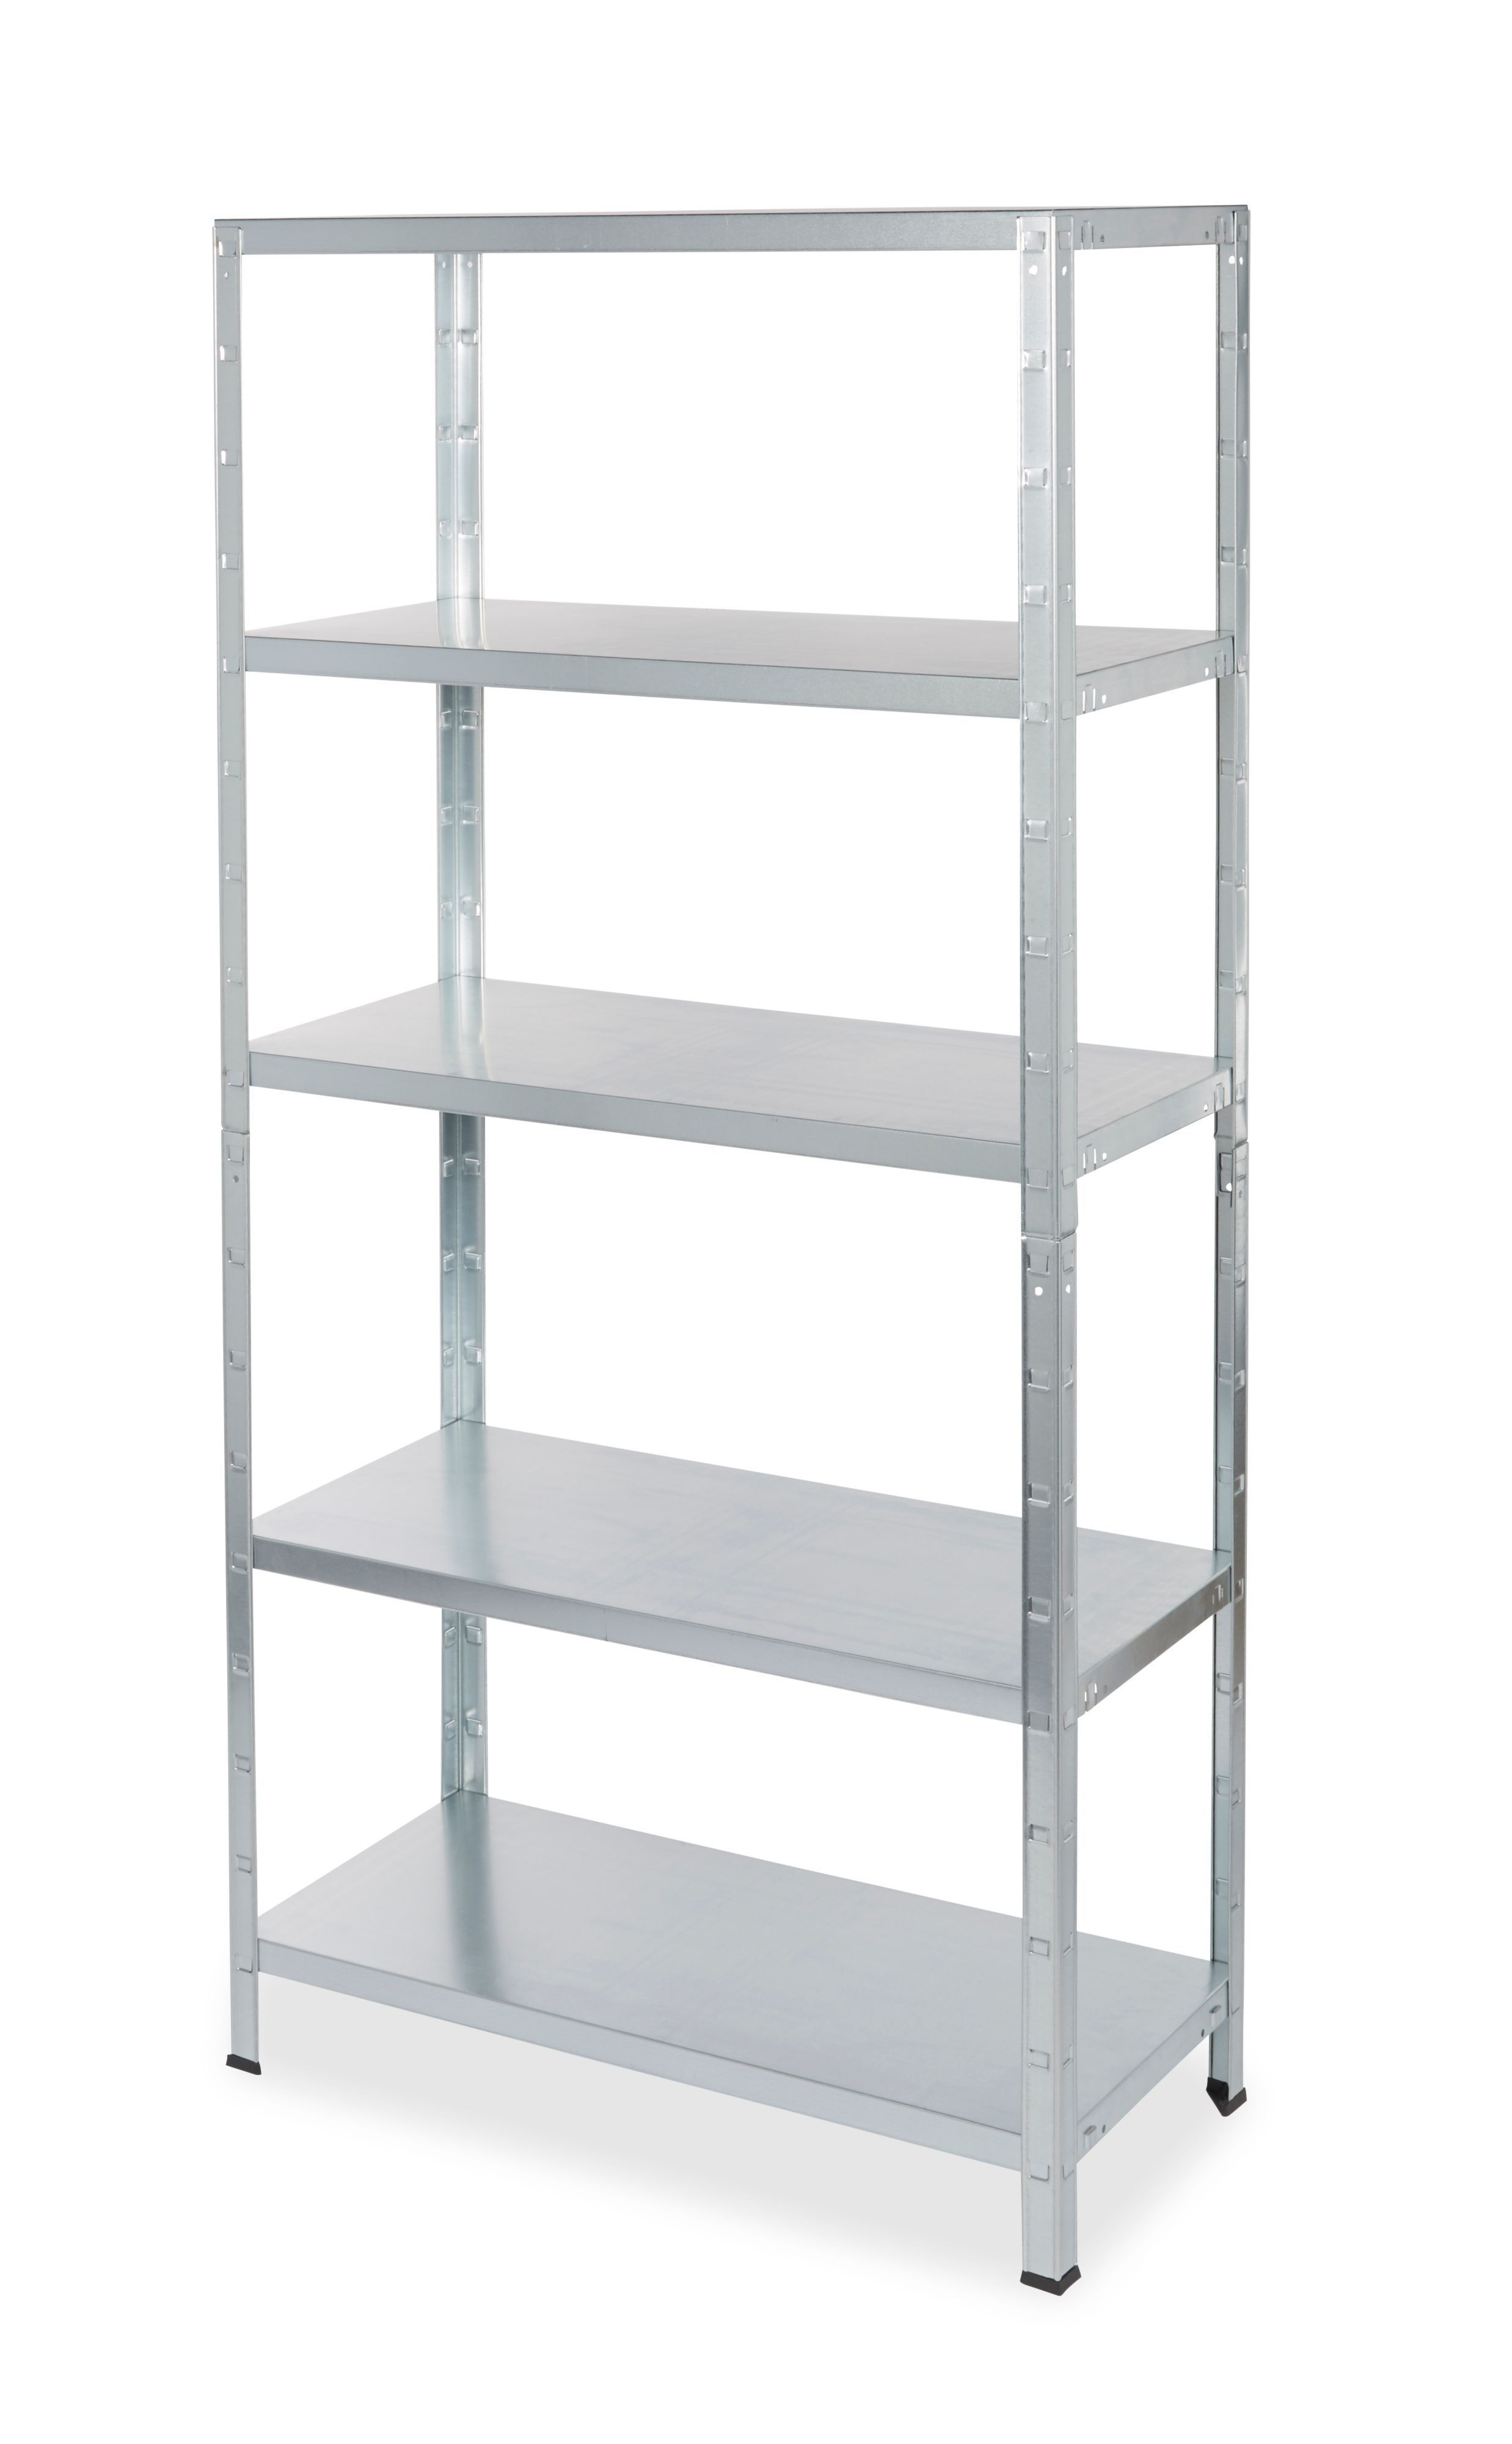 Form Axial 5 Shelf Steel Shelf Unit B Q 35 00 Height Mm 1800mm Width Mm 900mm Depth Mm 400mm Shelving Unit Steel Shelf Shelf Unit